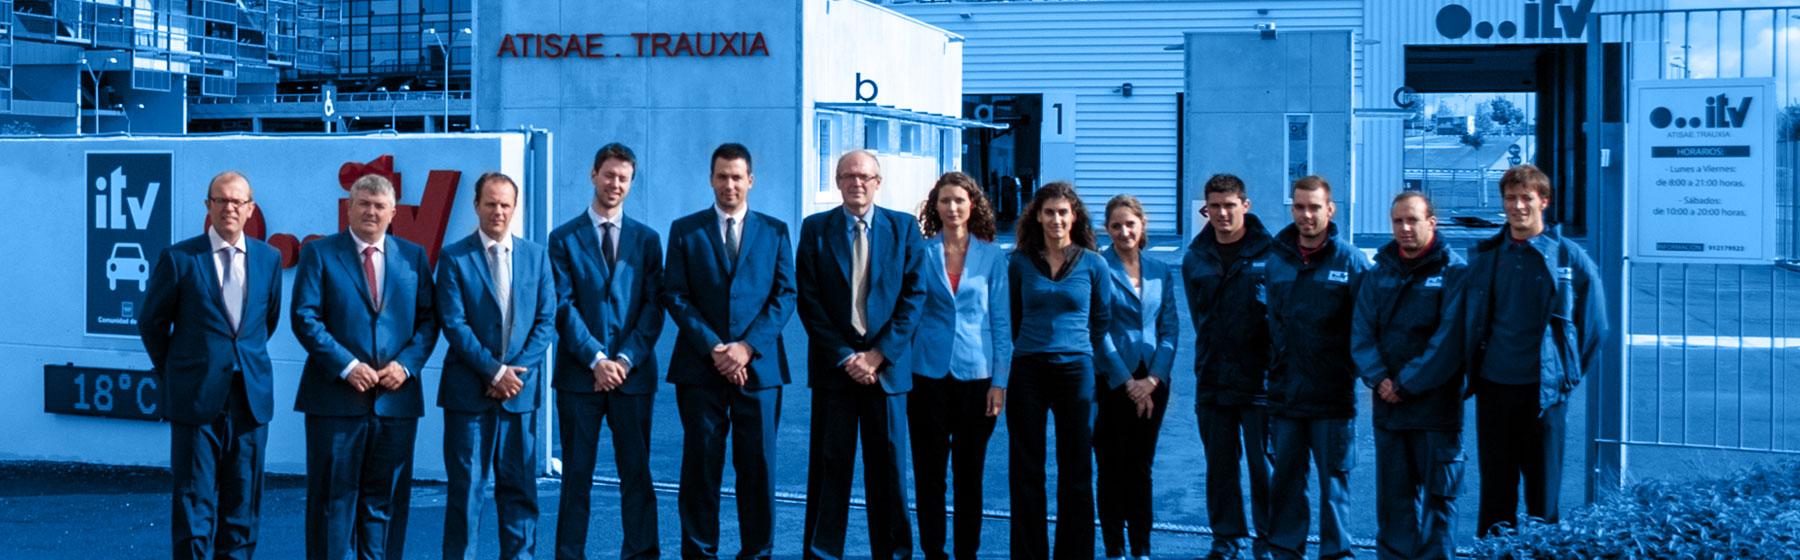 Equipo humano Trauxia